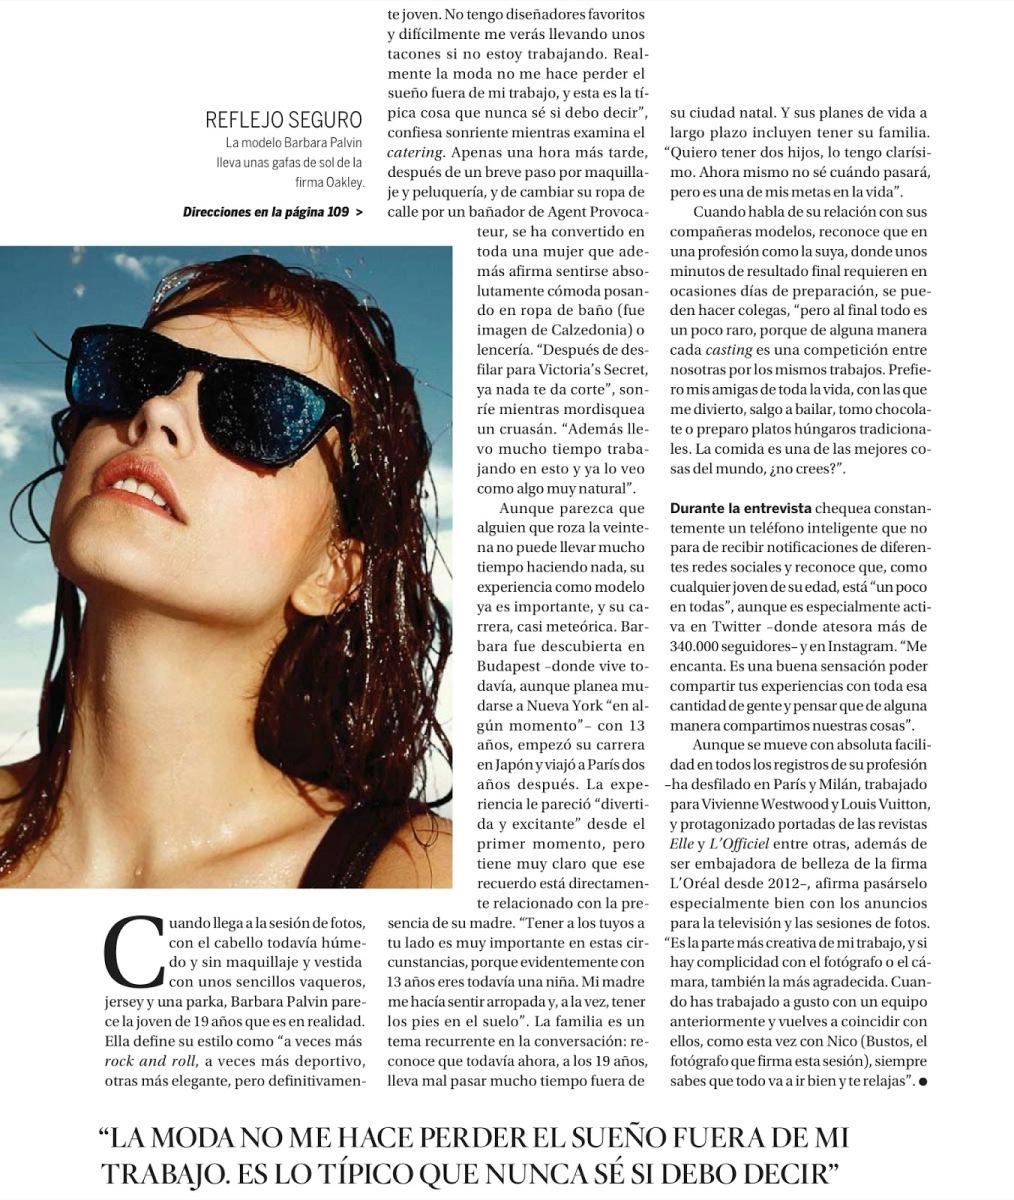 Barbara Palvin By Nico For El País Semanal 9Th June 2013